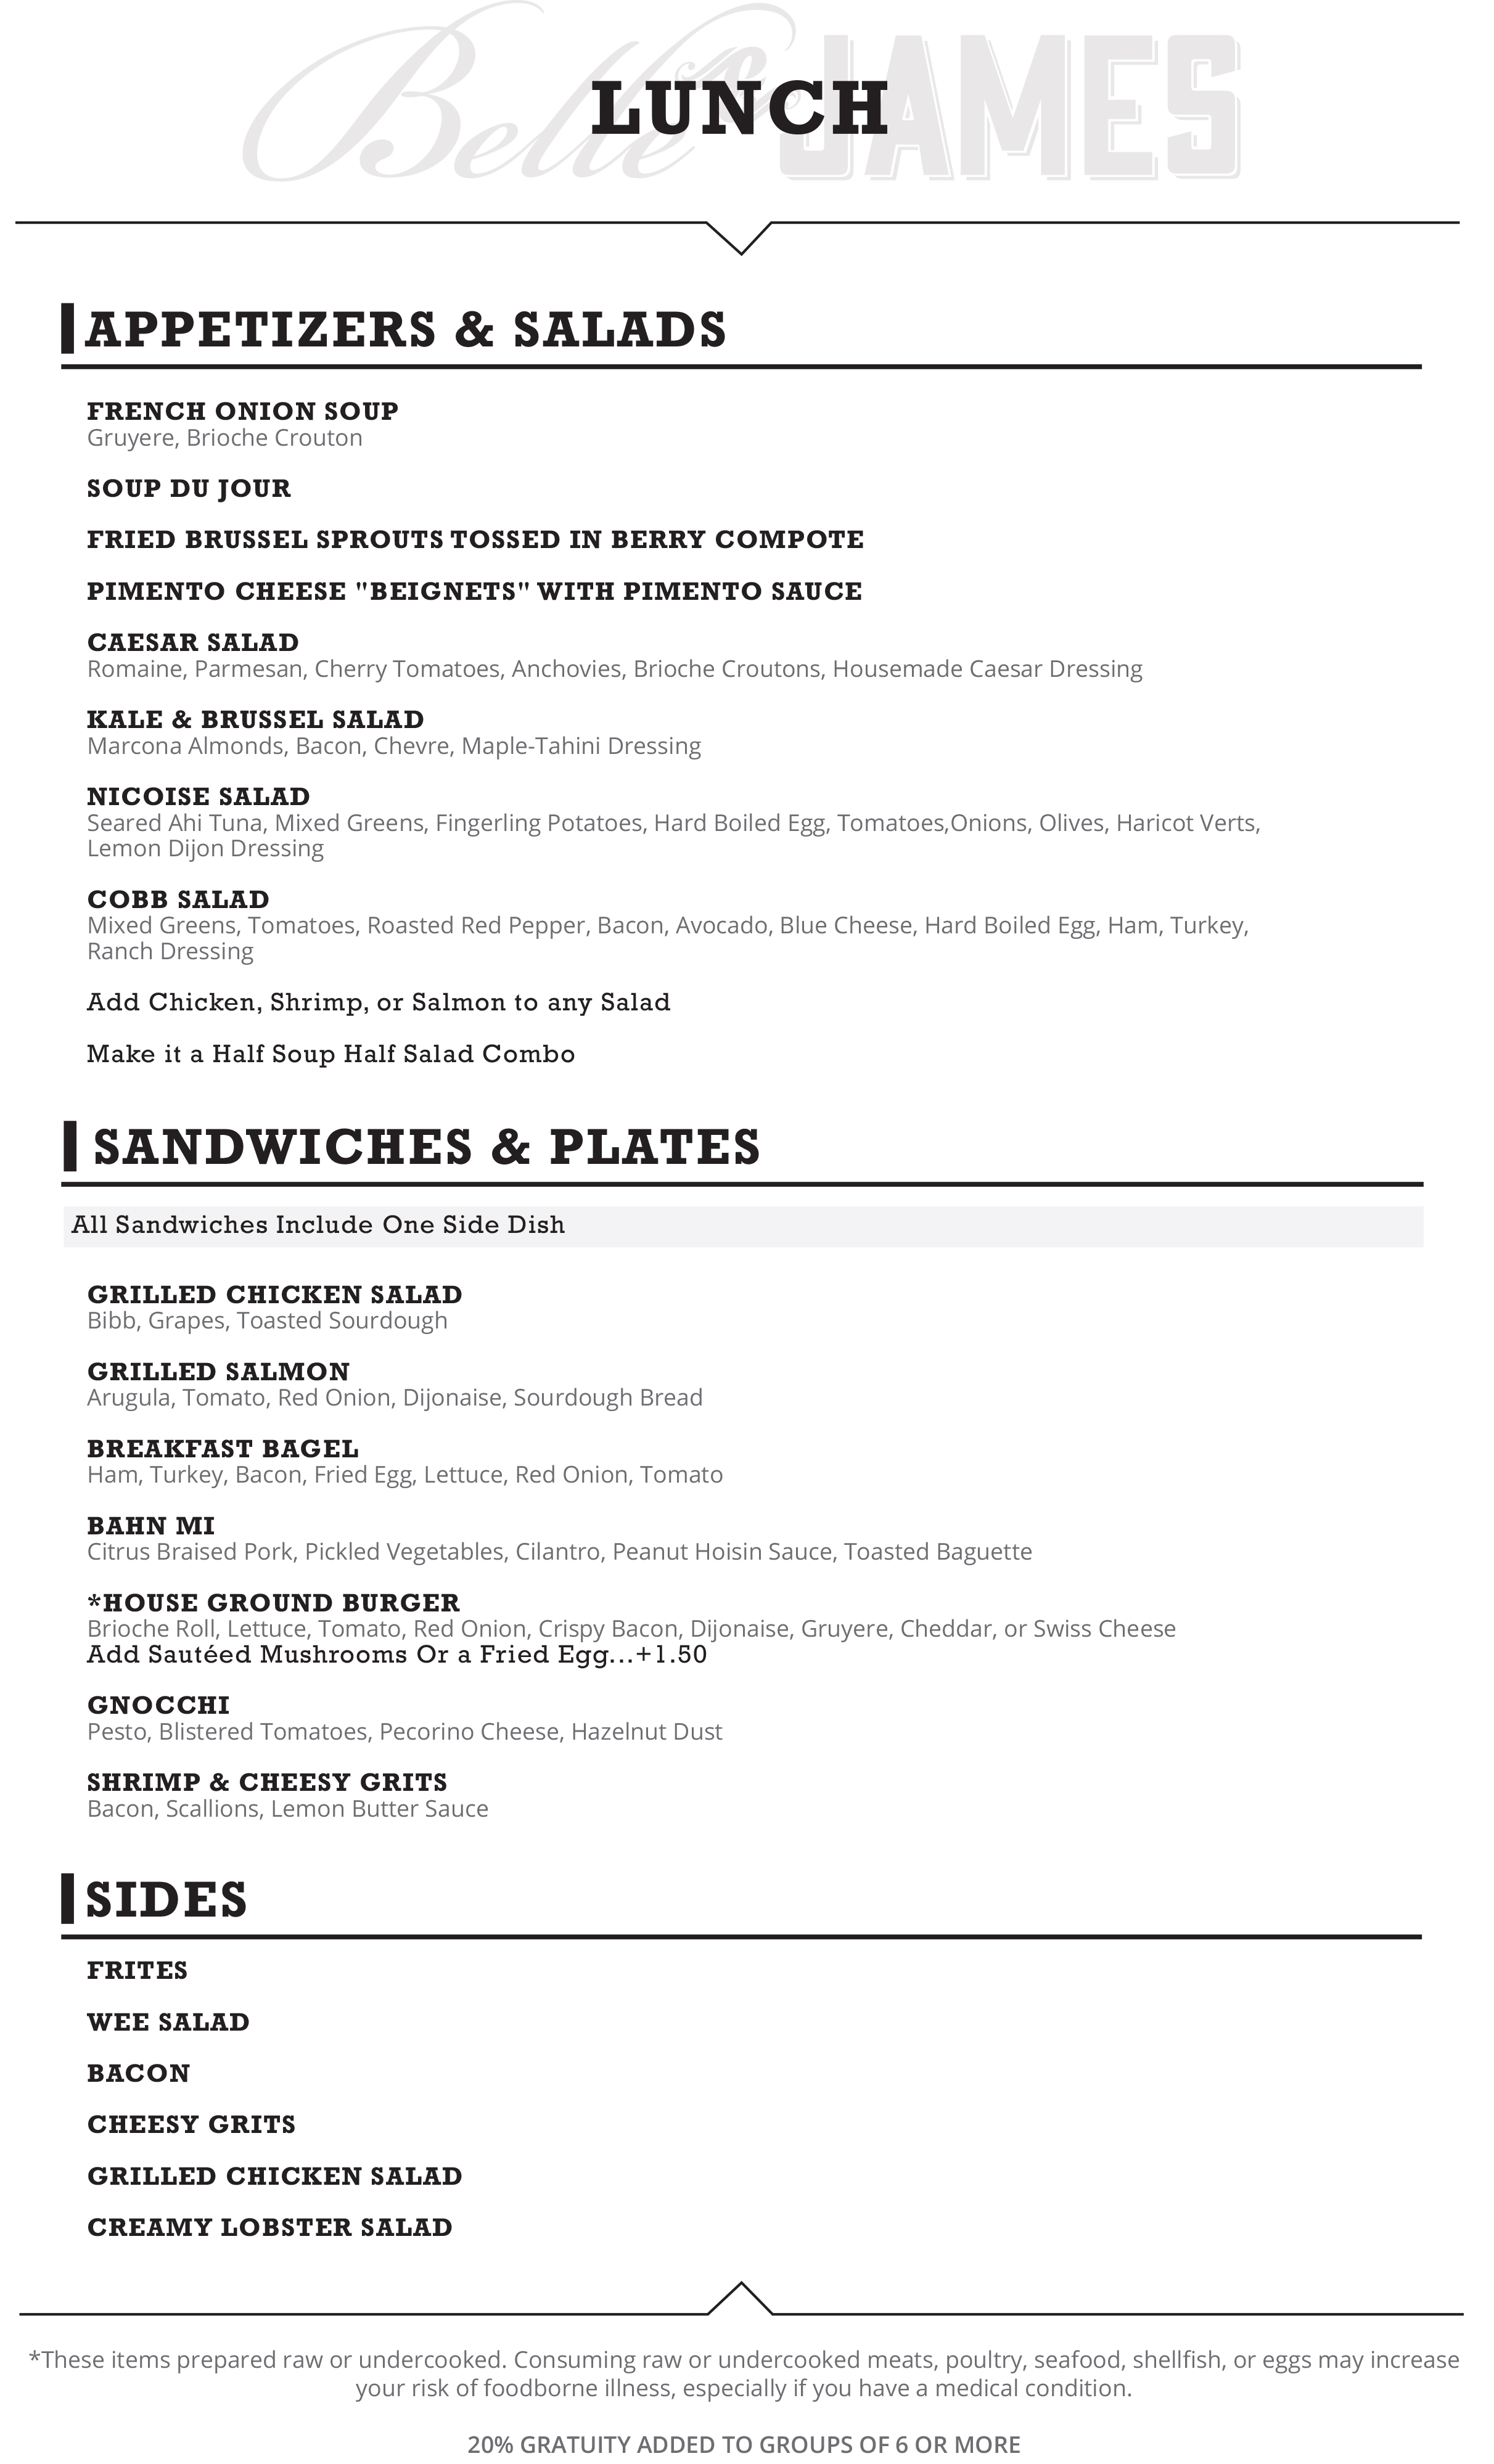 belle and james richmond lunch menu